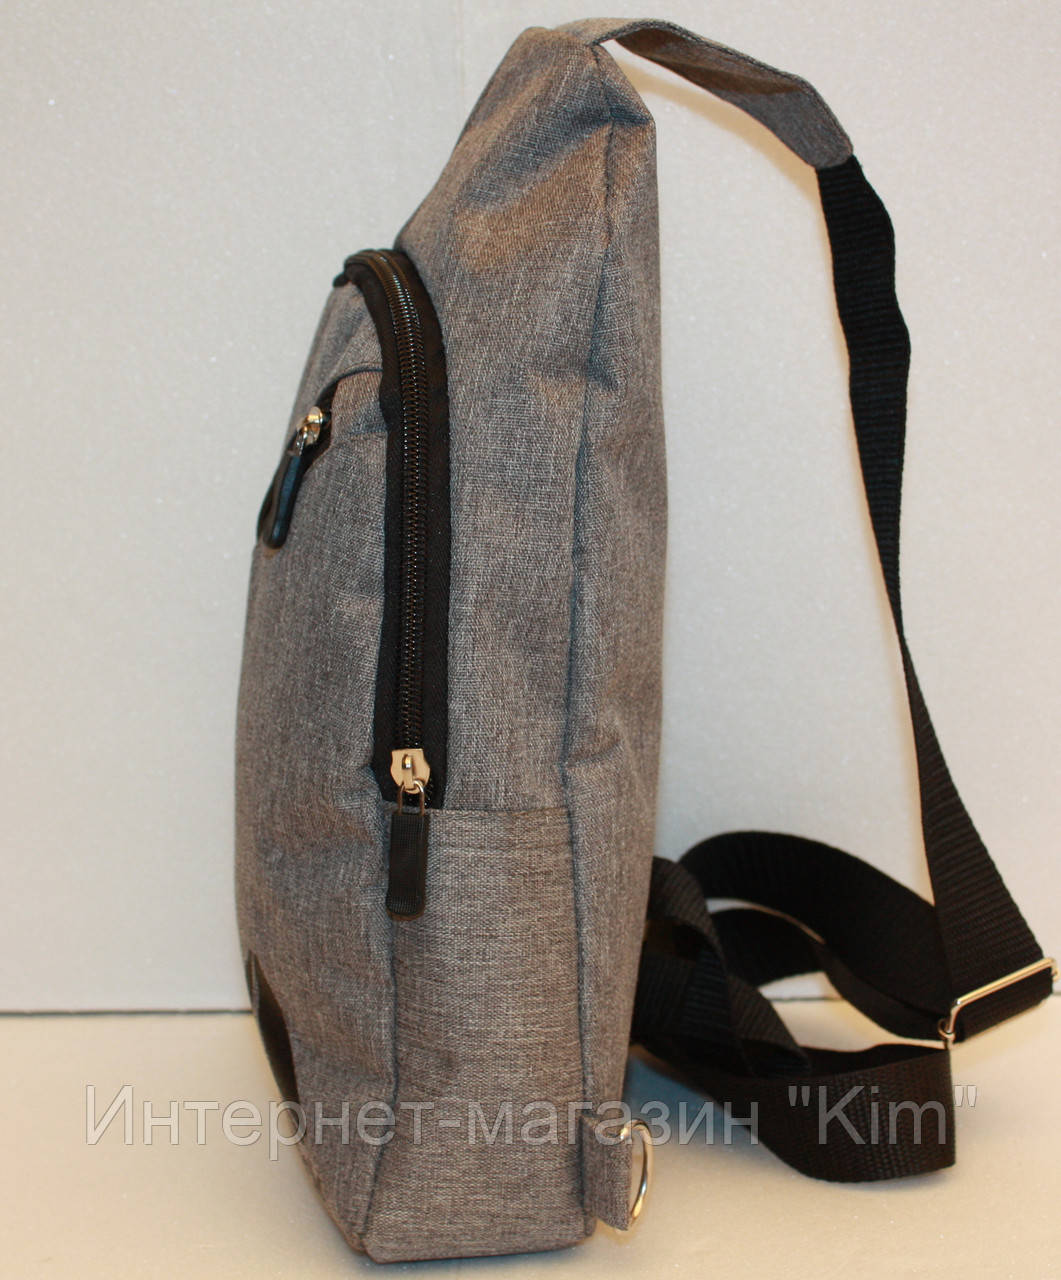 8757bc60 Сумка слинг через плечо в стиле Nike светло-серая: продажа, цена в ...